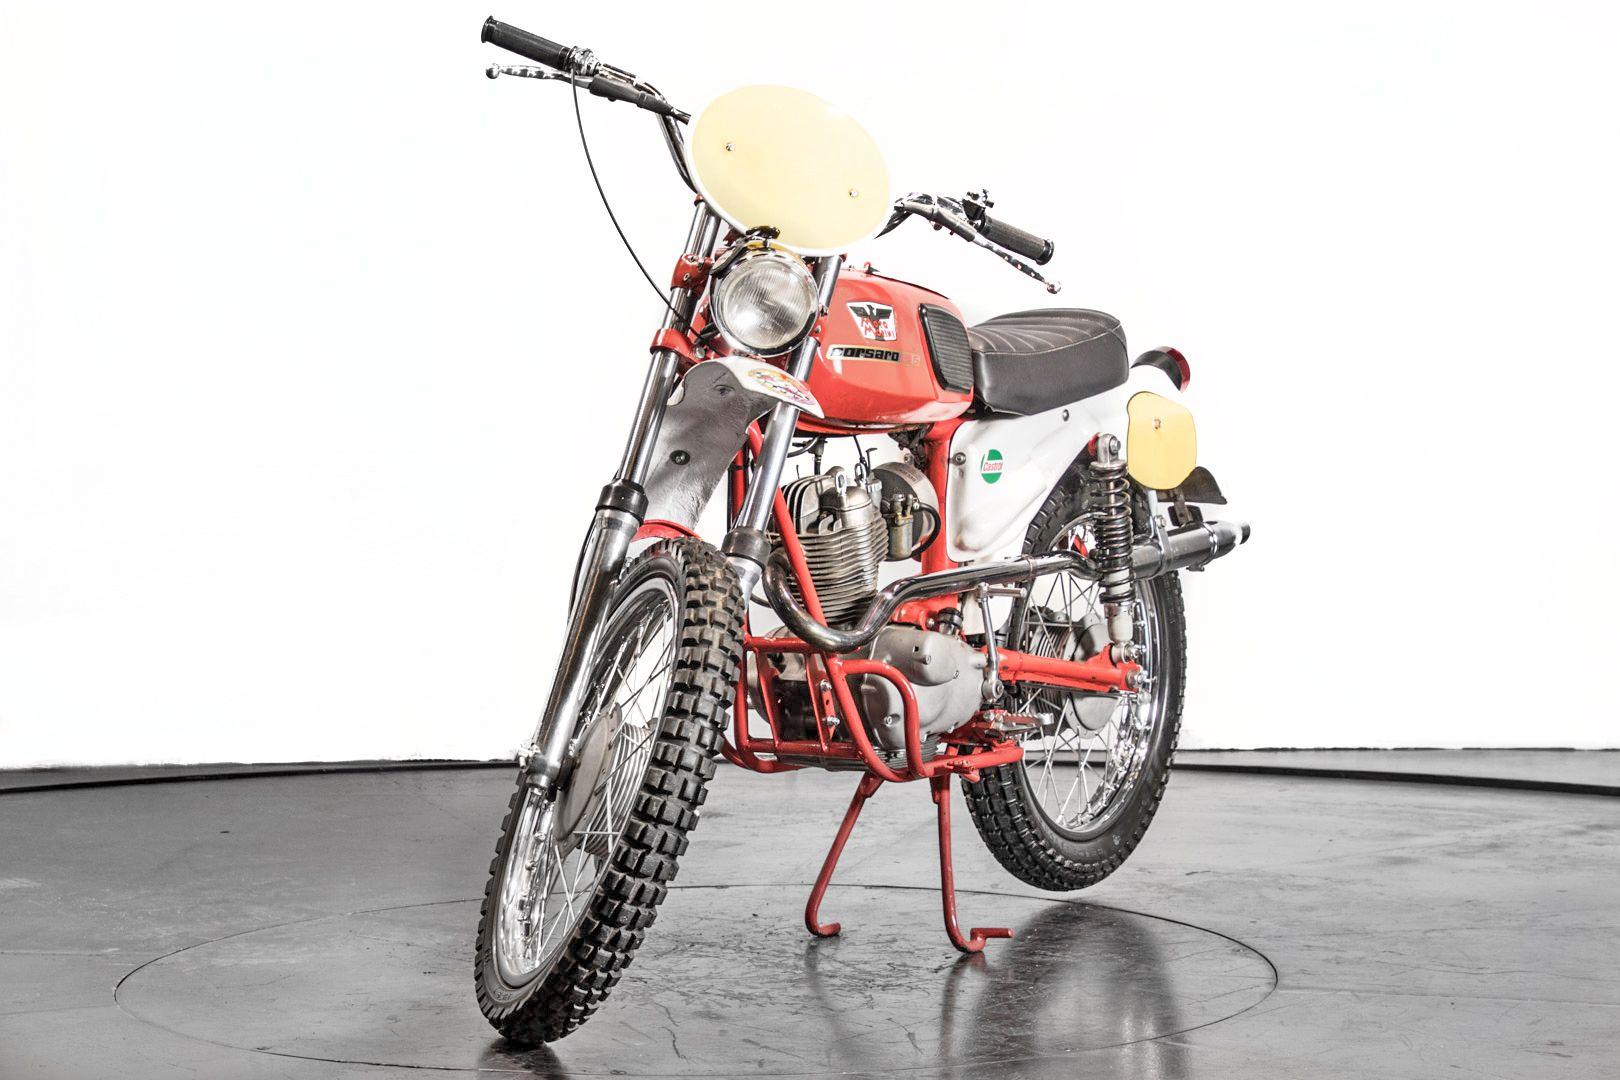 1959 Moto Morini Corsaro 125 37755